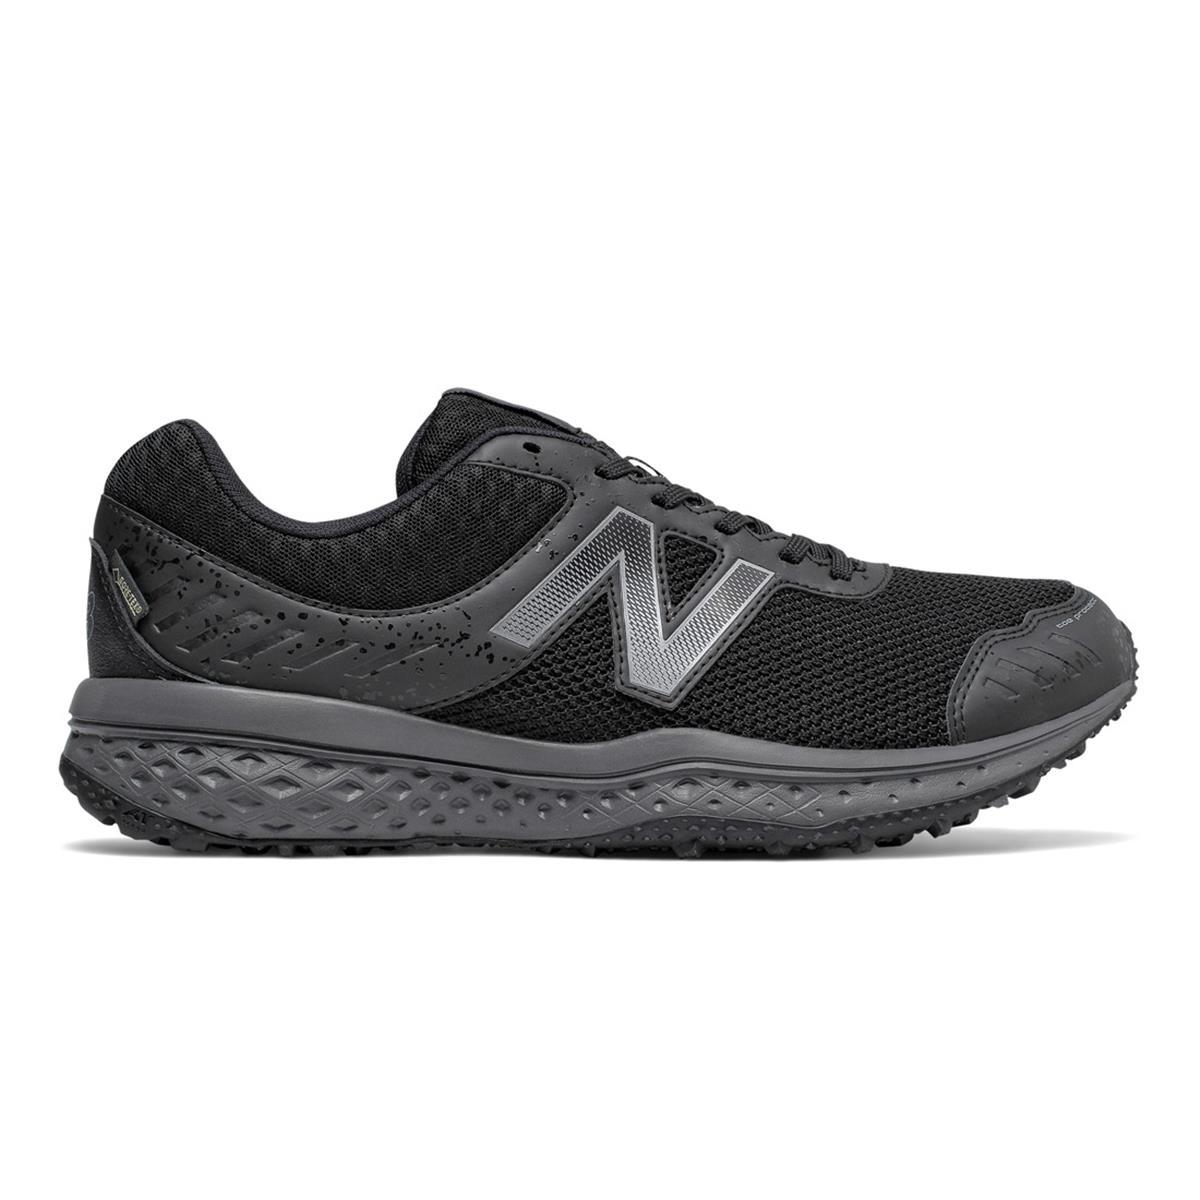 New Balance Mt620 V2 Gore Tex Mens Trail Running Shoes